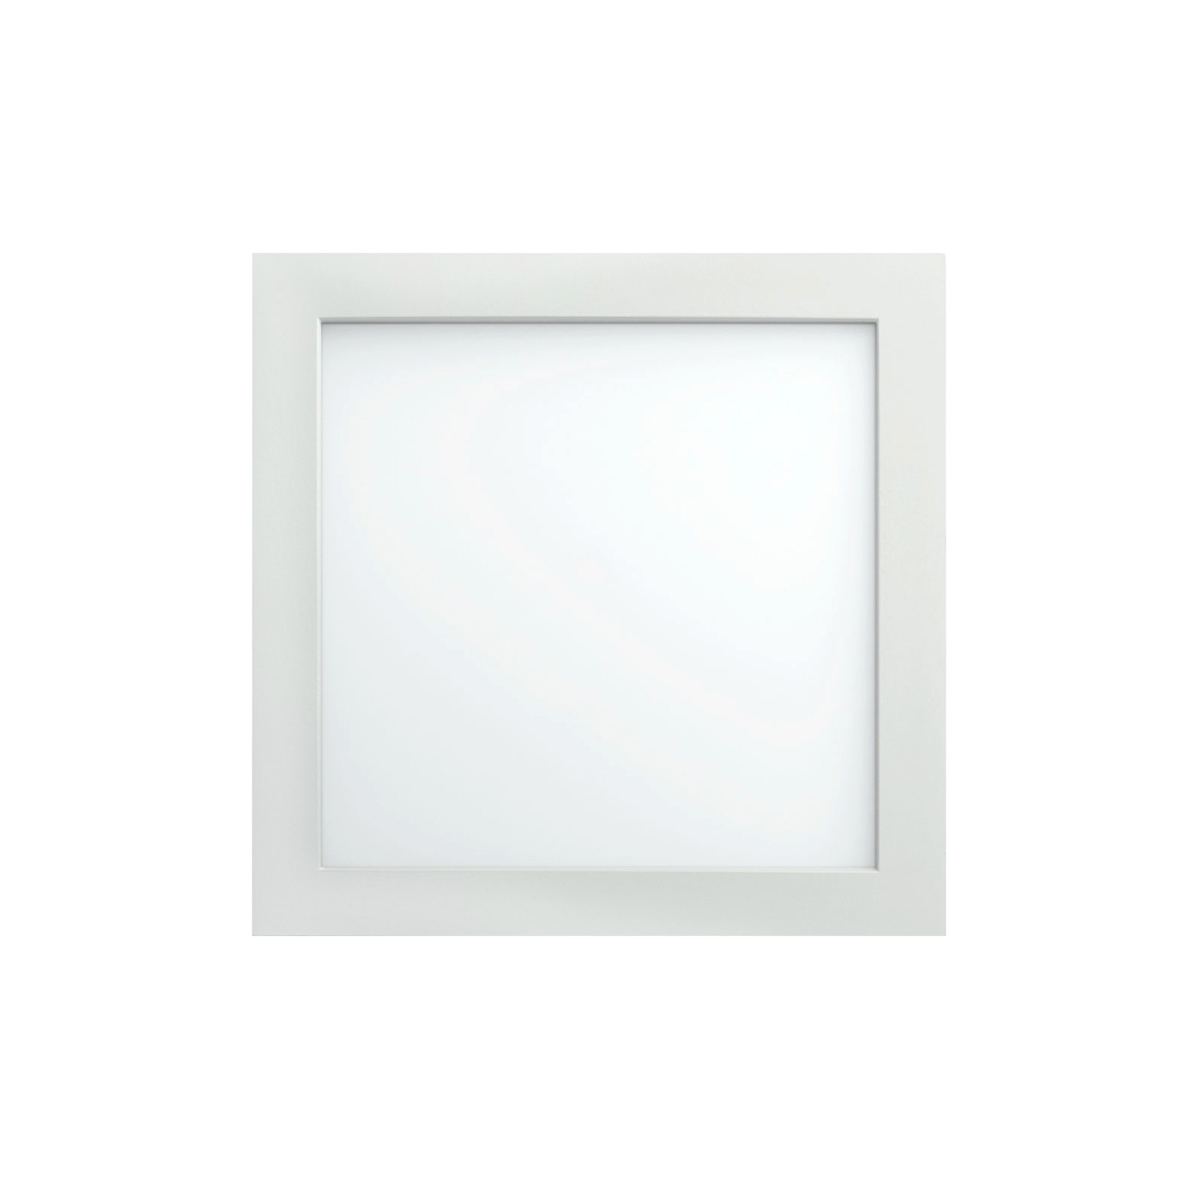 Mini aircom cuadrado luminaria downlight secom iluminaci n - Sistemas de iluminacion interior ...